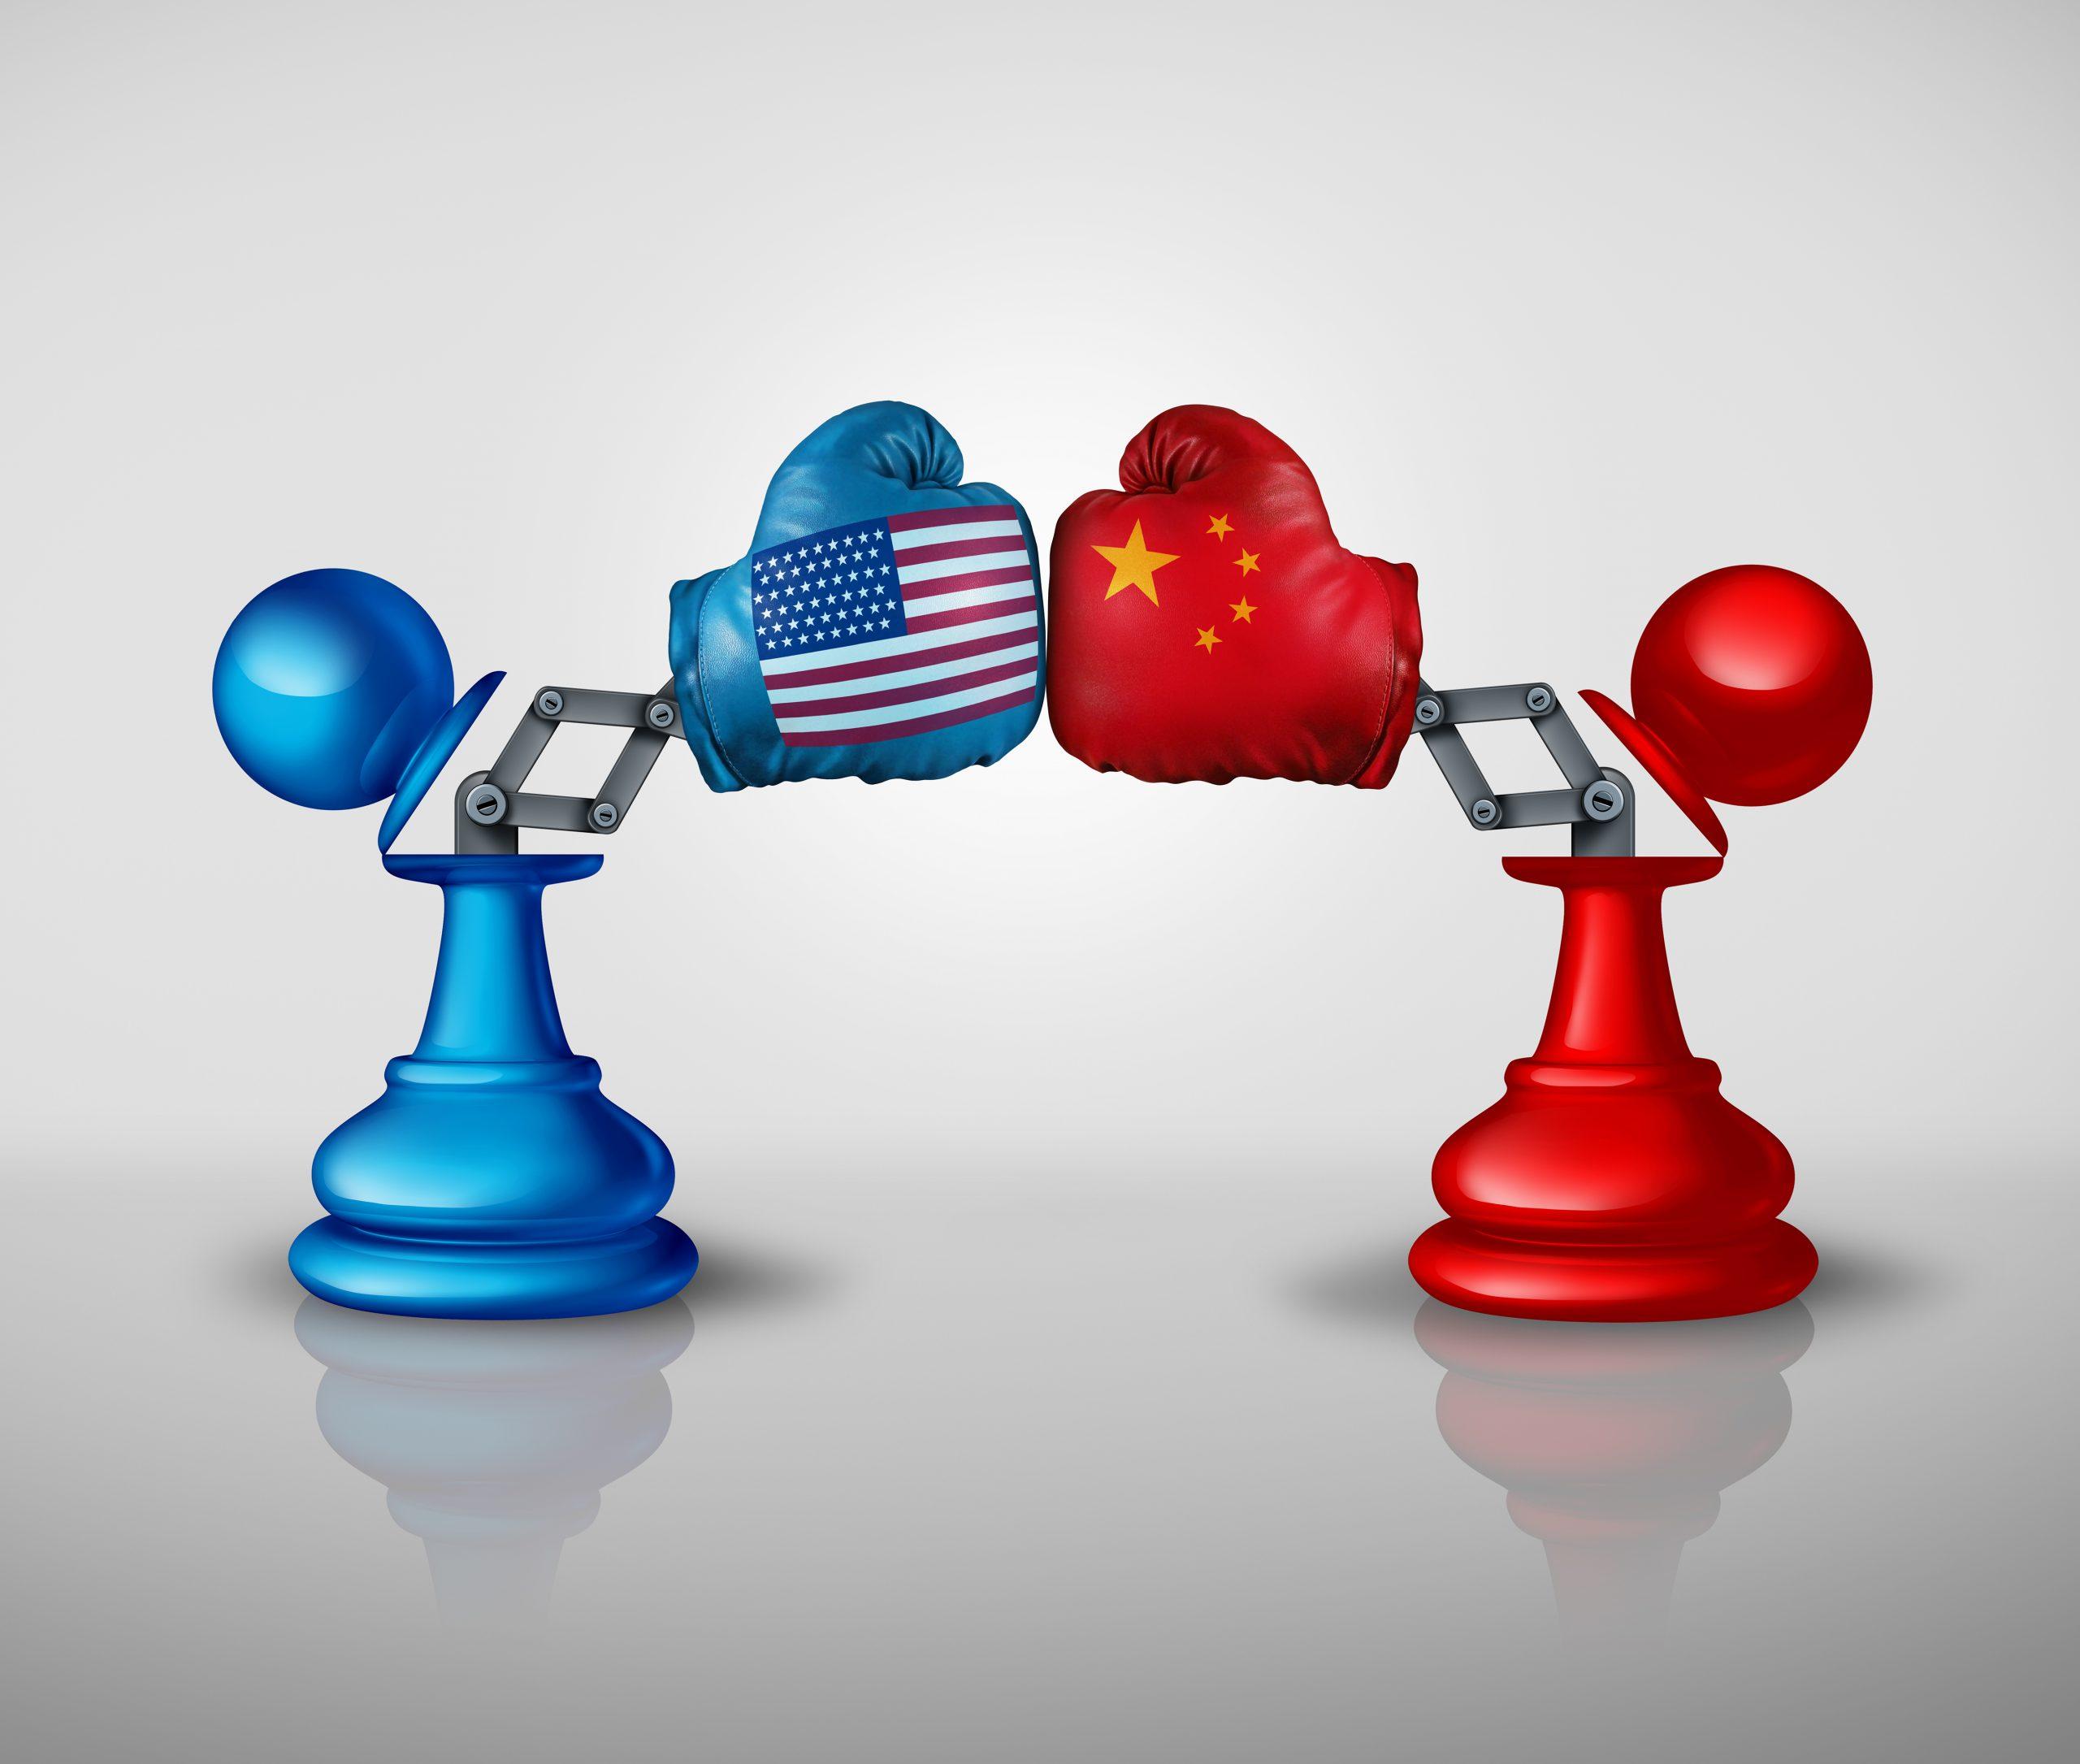 https://depositphotos.com/200310788/stock-photo-china-united-states-trade-war.html